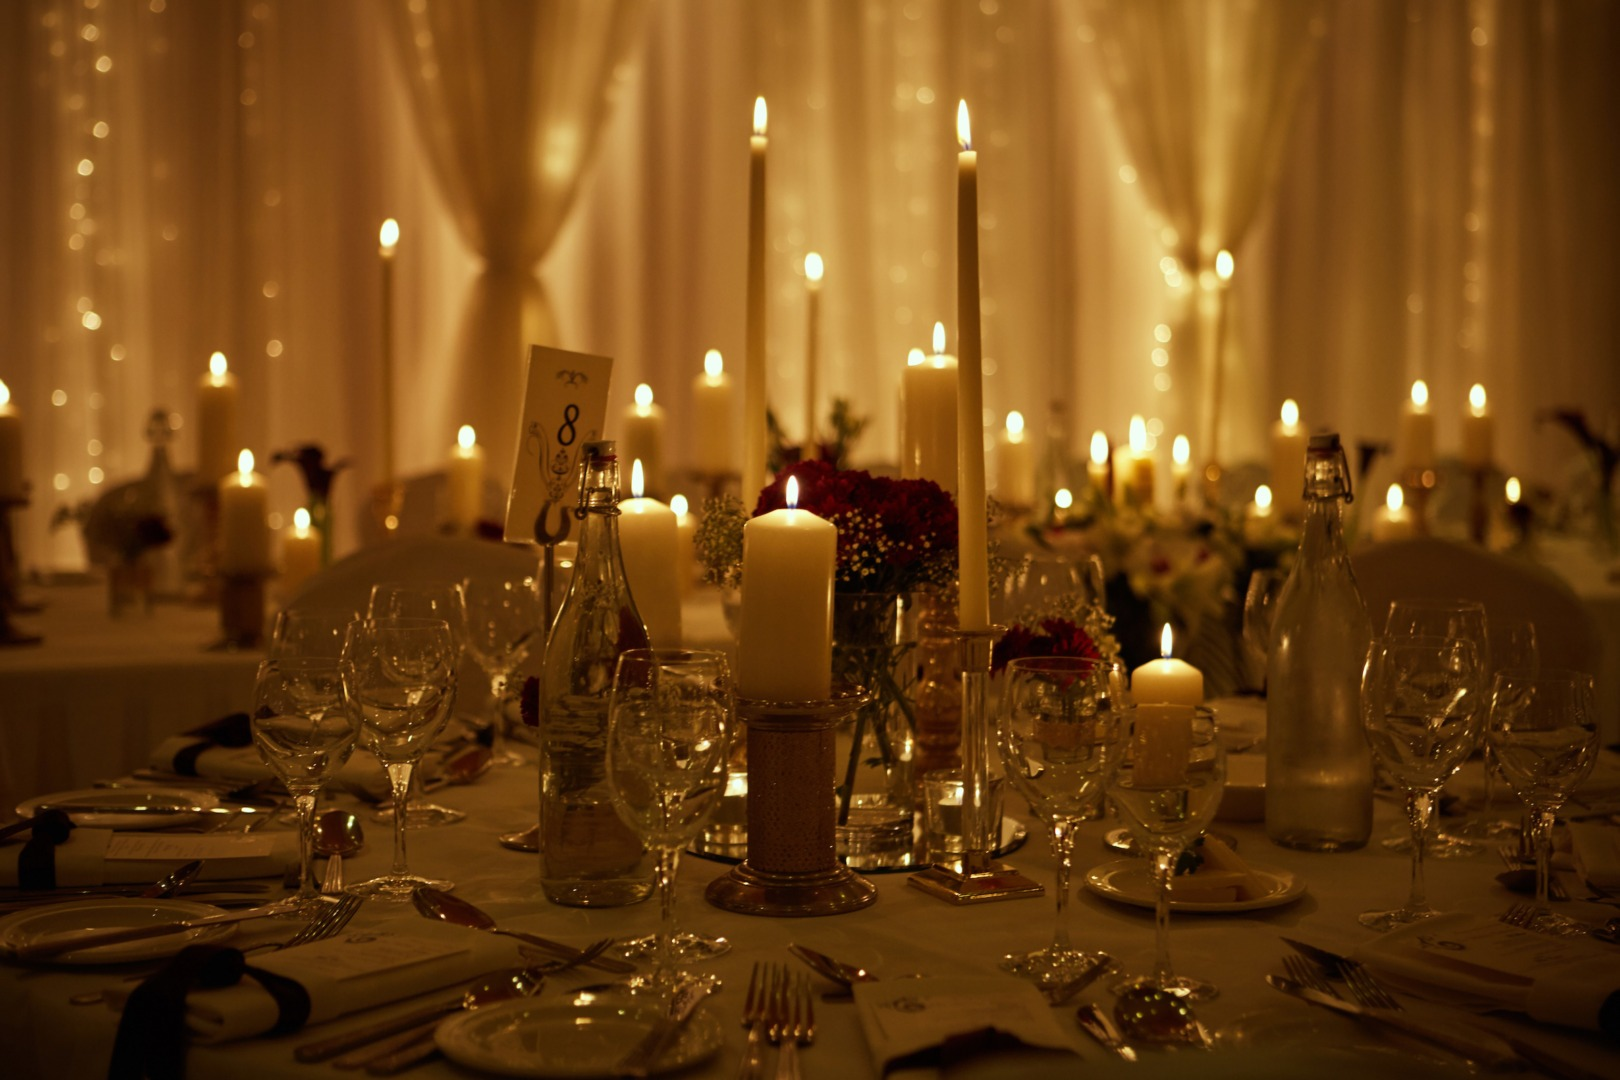 candle decoration - Candle Decoration